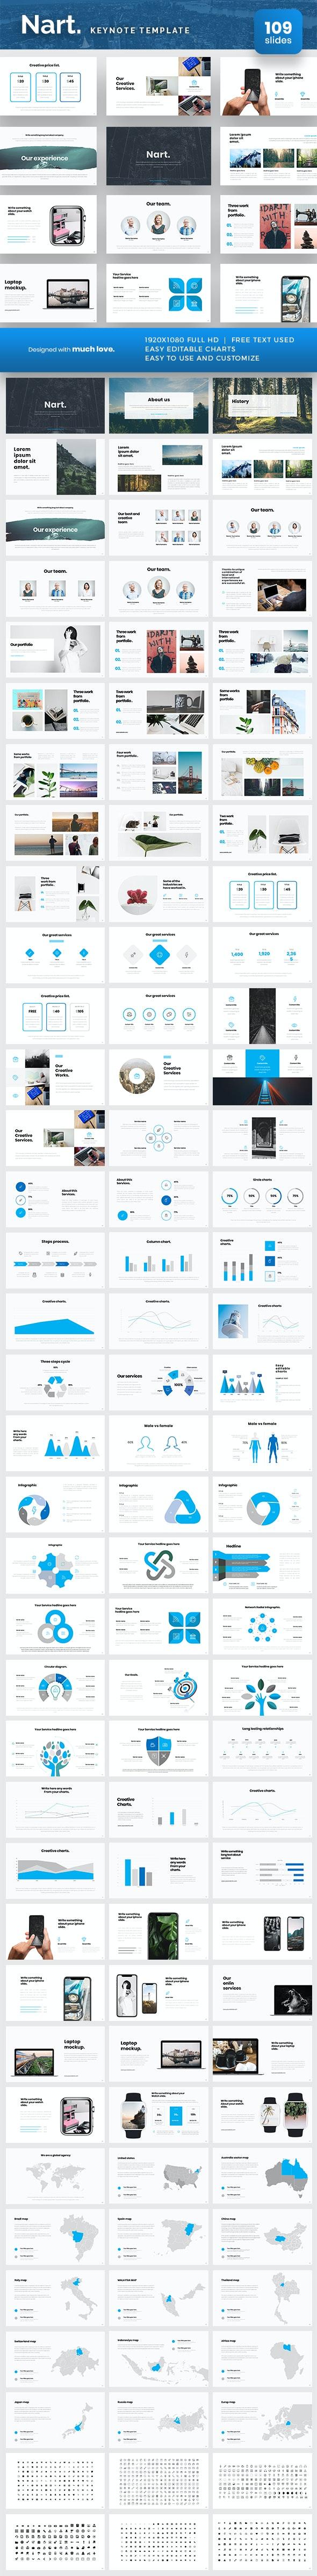 Nart Keynote Presentation Template - Keynote Templates Presentation Templates